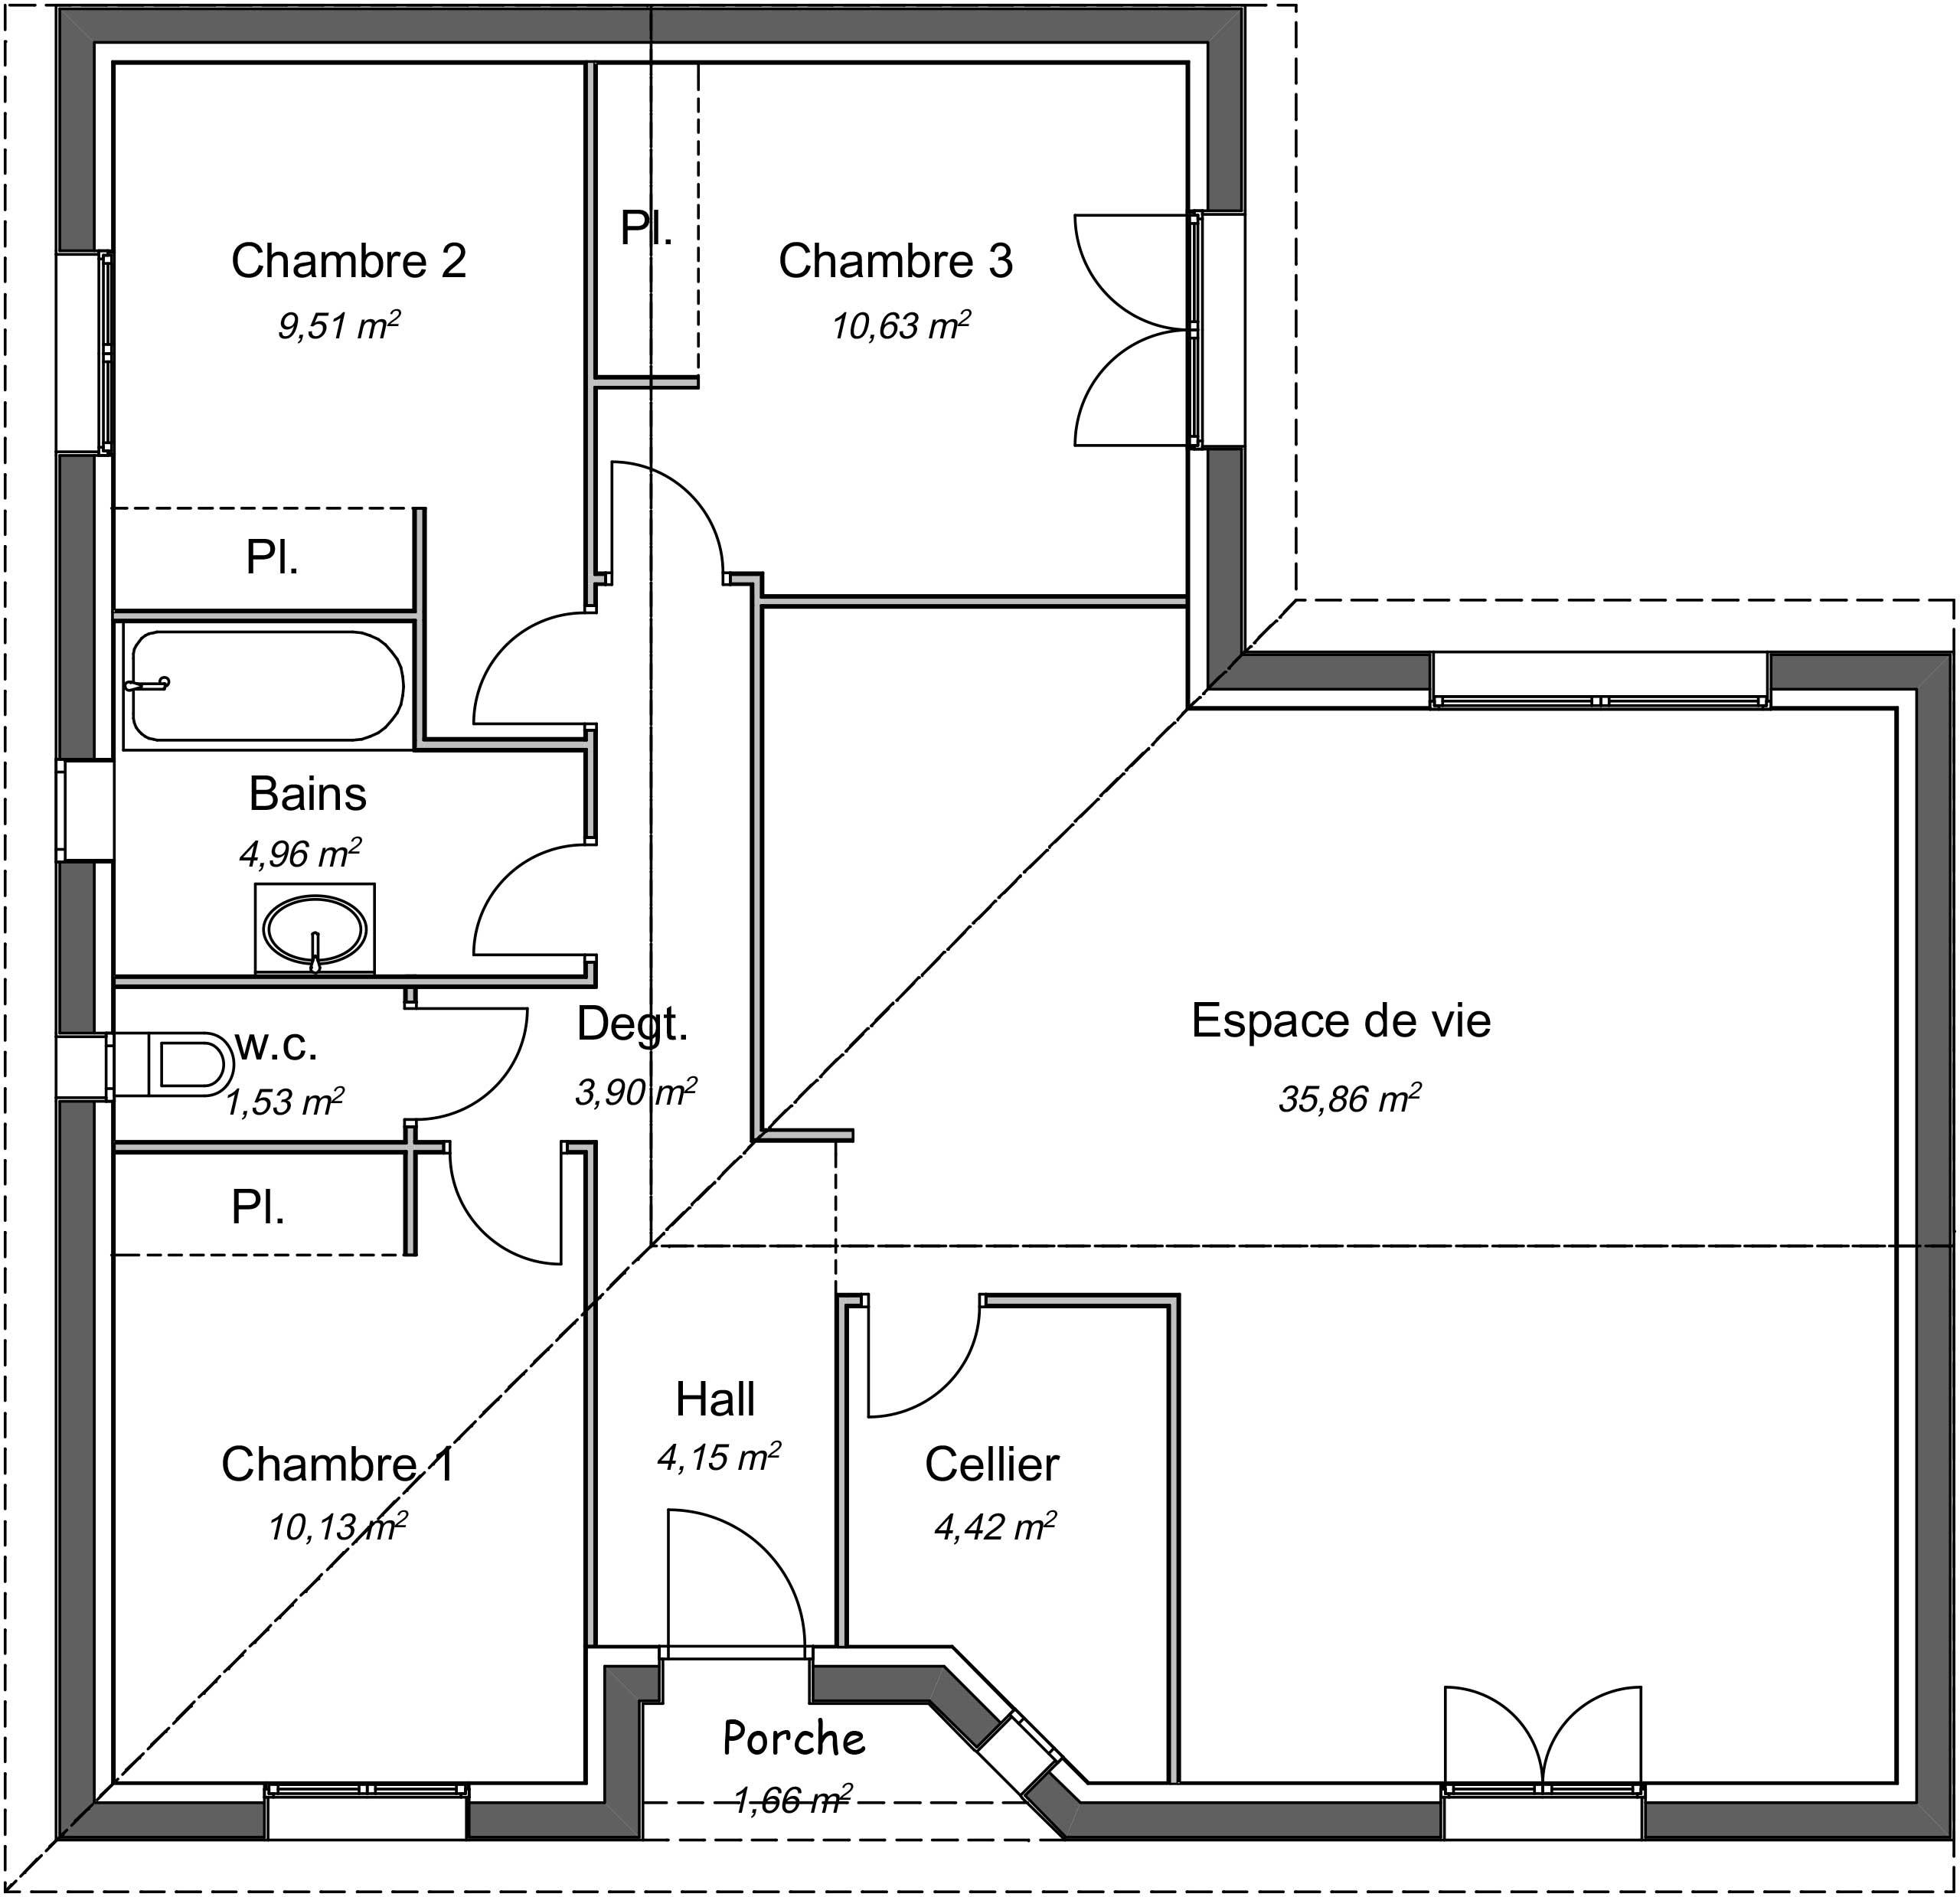 Plan Maison Plain Pied 90m2 2 Chambres | Ventana Blog